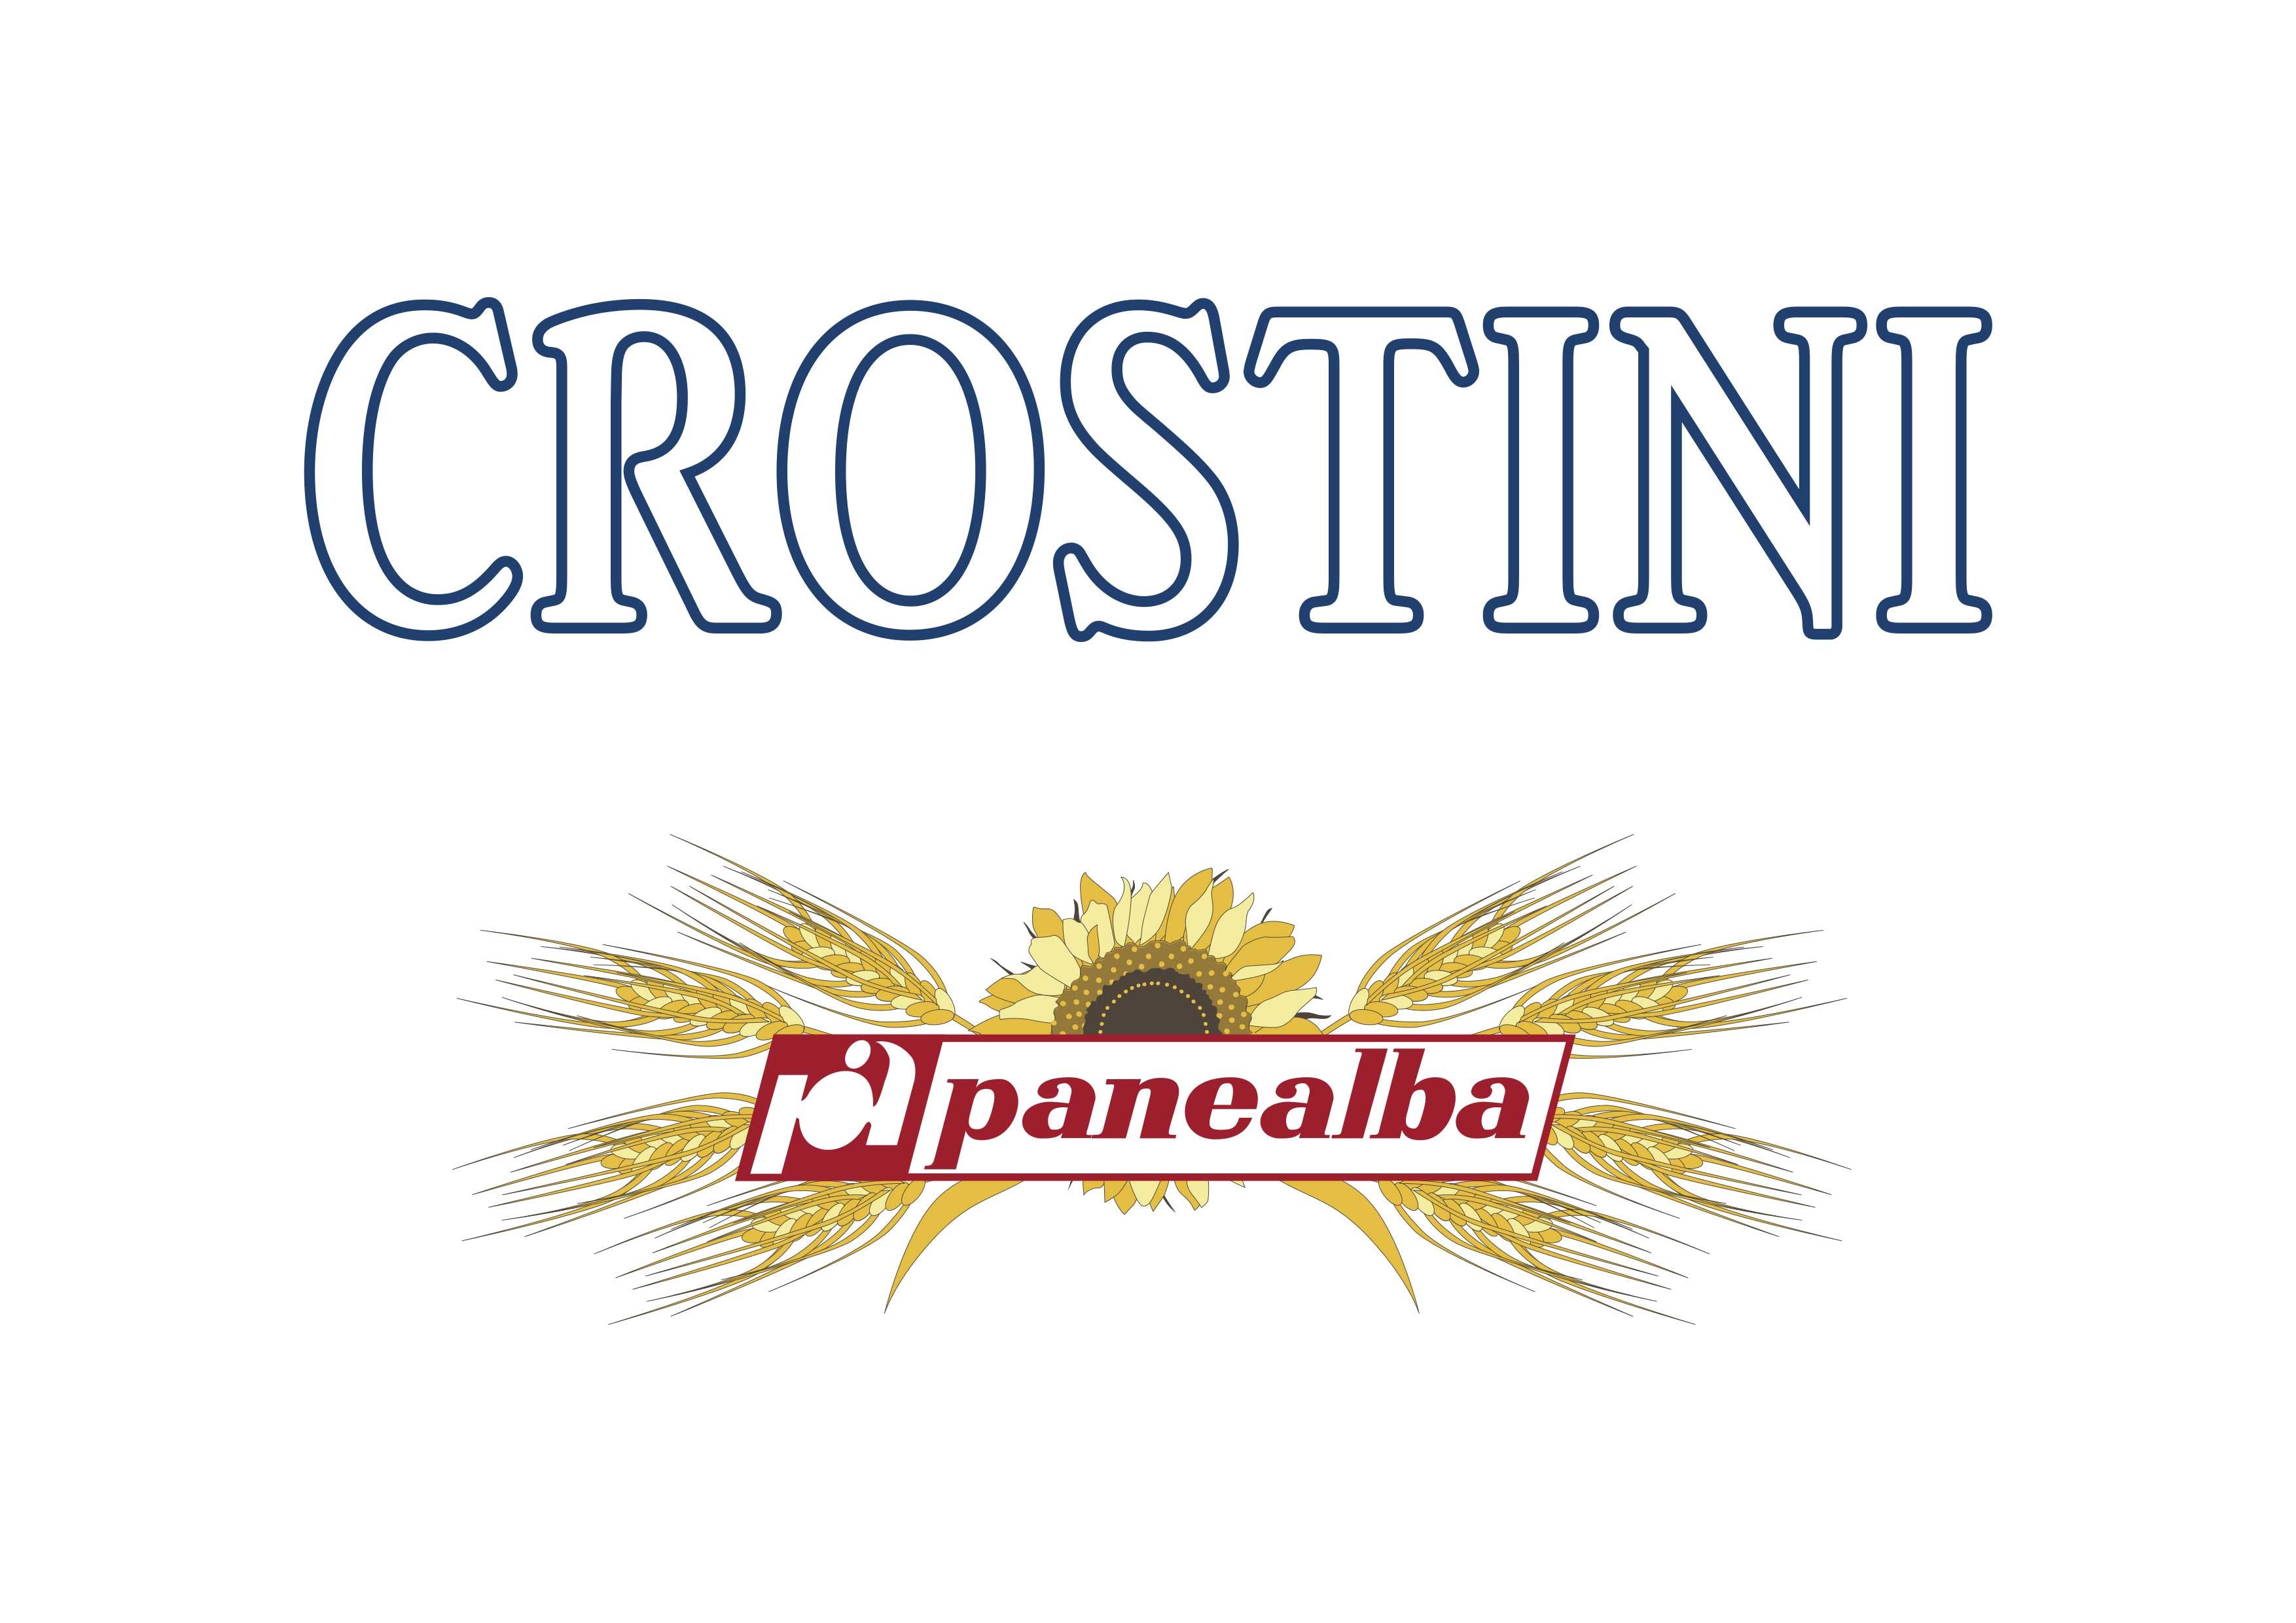 logo-Panealba-crostini